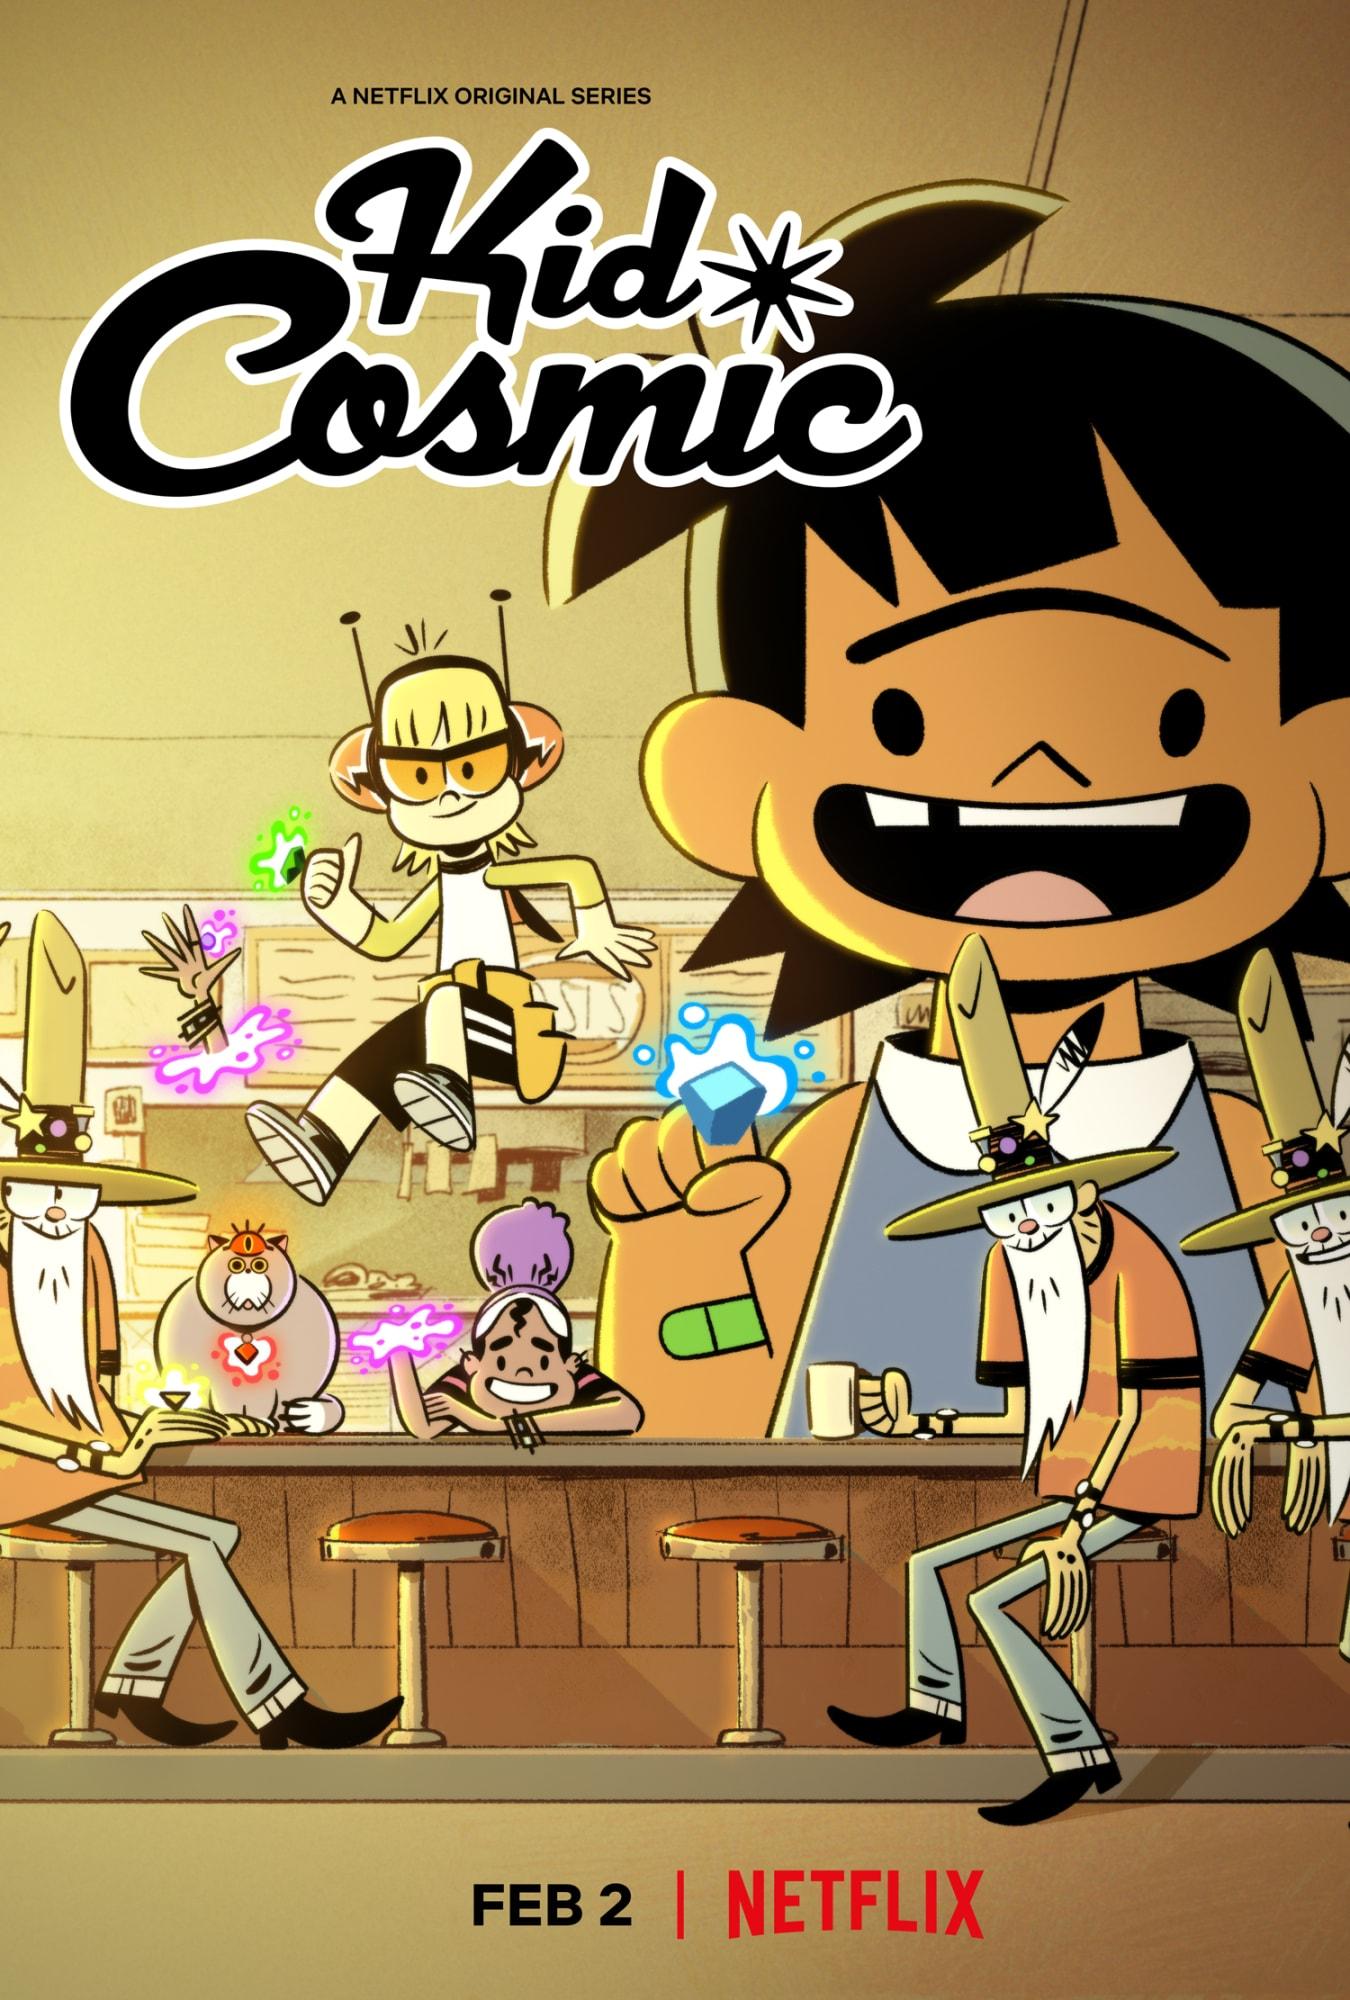 Kid Cosmic (2021) S02 Hindi English Animation WEB Series || 480p, 720p Zip File